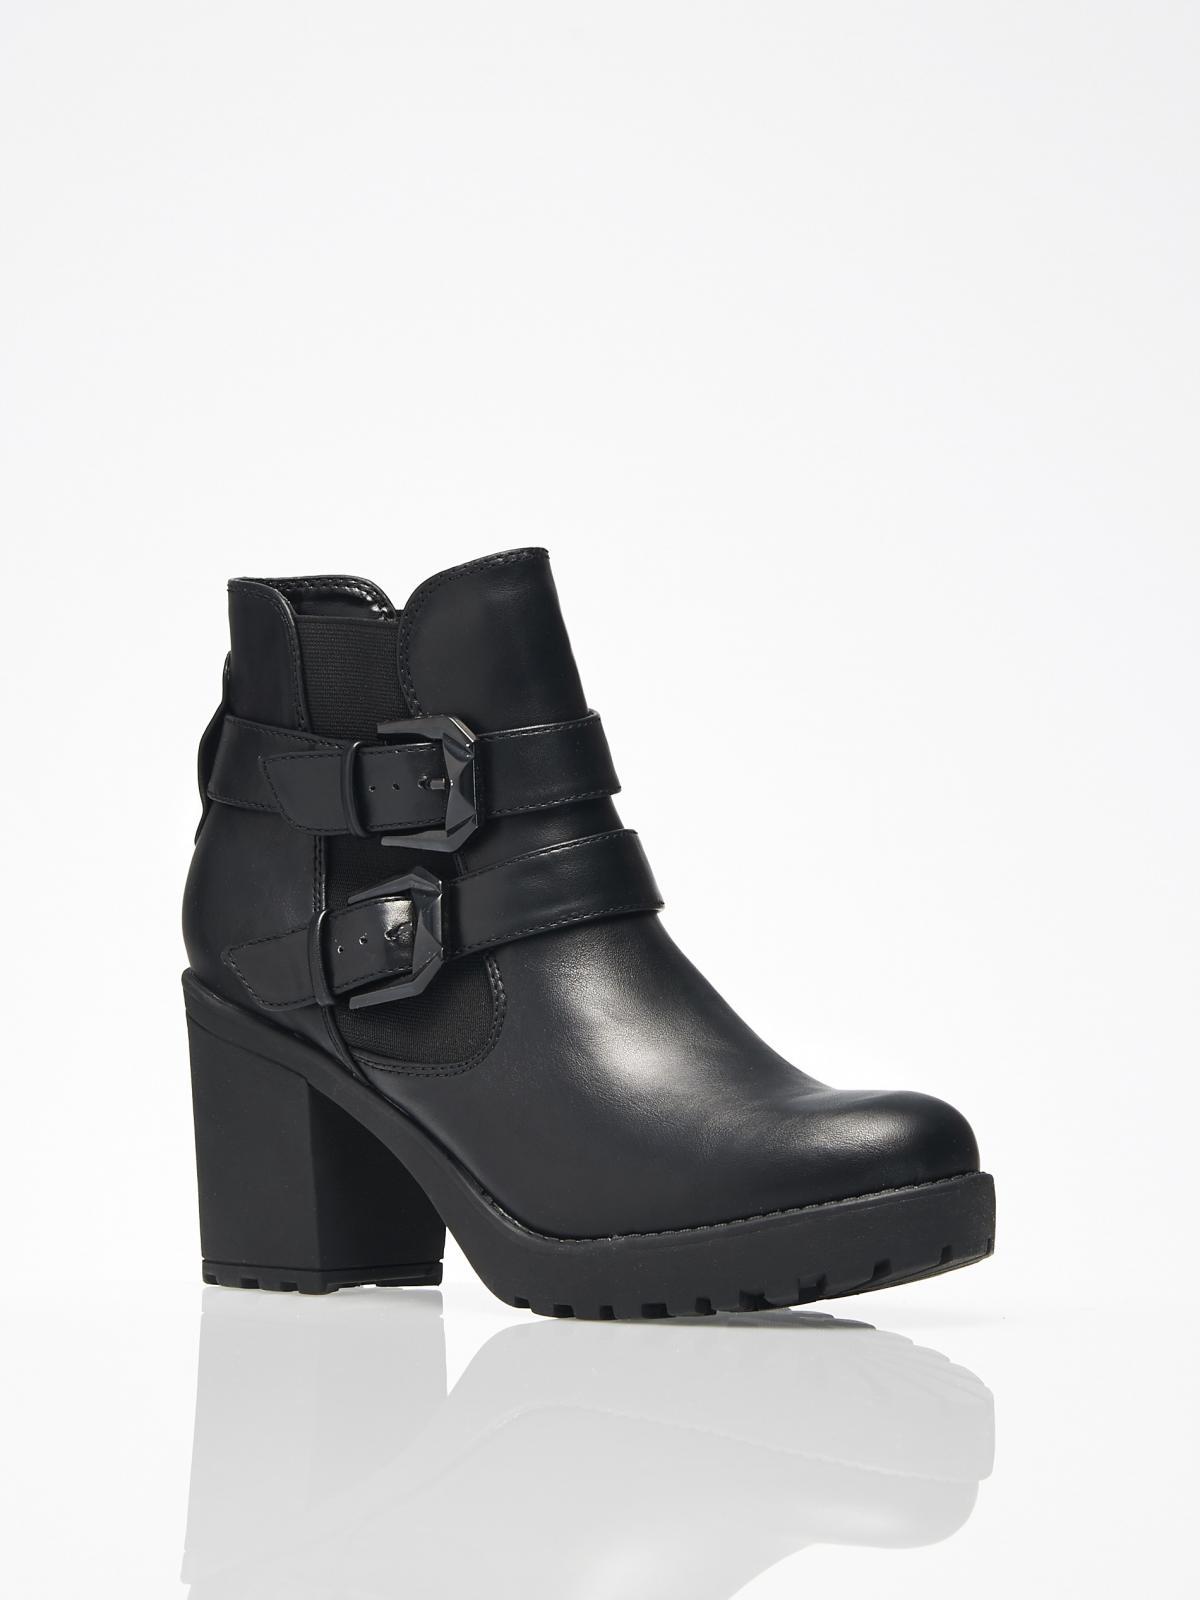 0a4f288fd59ca czarne botki Mohito z klamrami - Buty na jesień - 37 modnych modeli ...